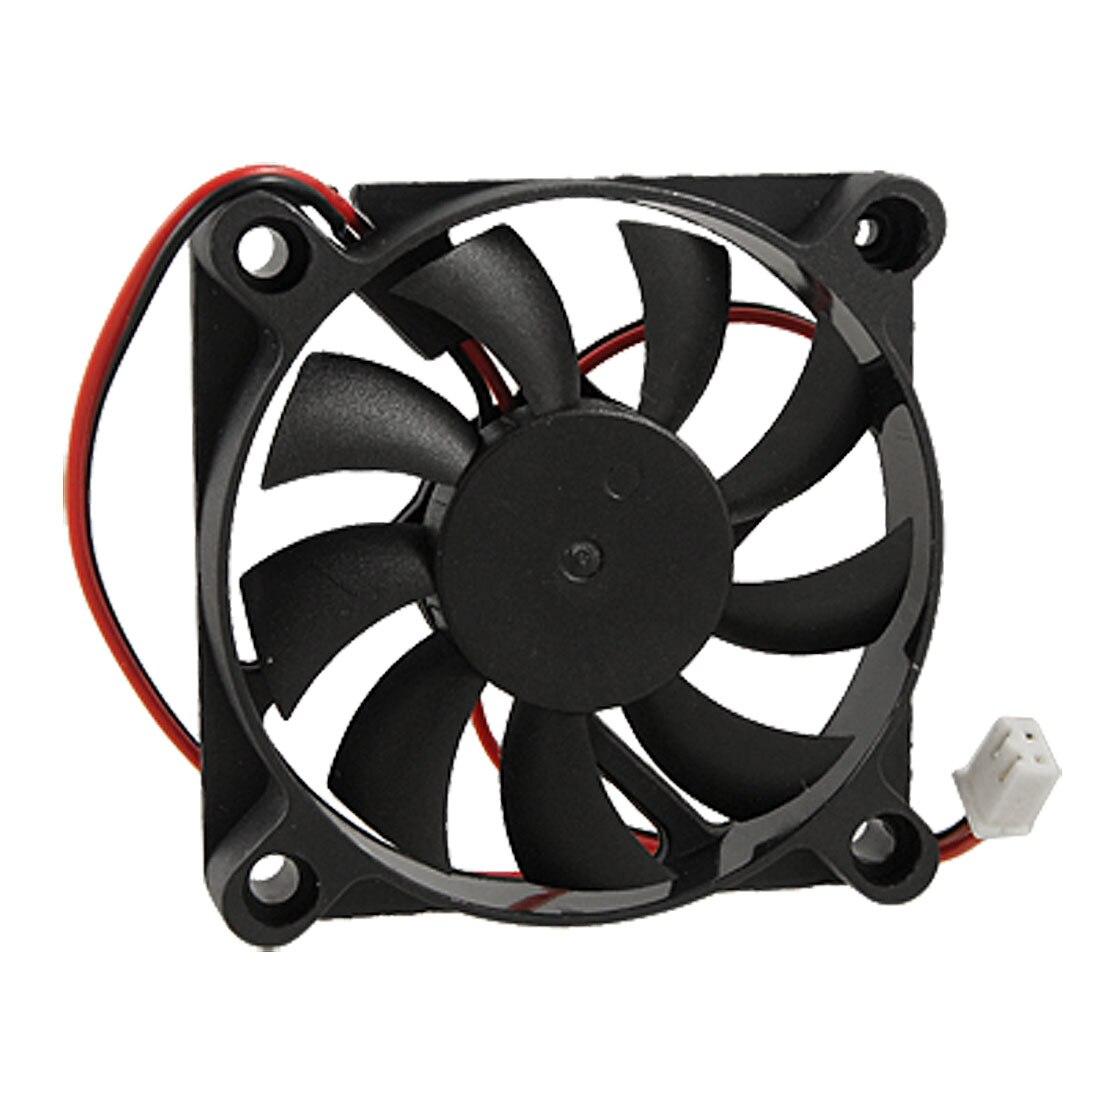 CAA Hot Desktop PC Case DC 12V 0.16A 60mm 2 Pin Cooler Cooling Fan